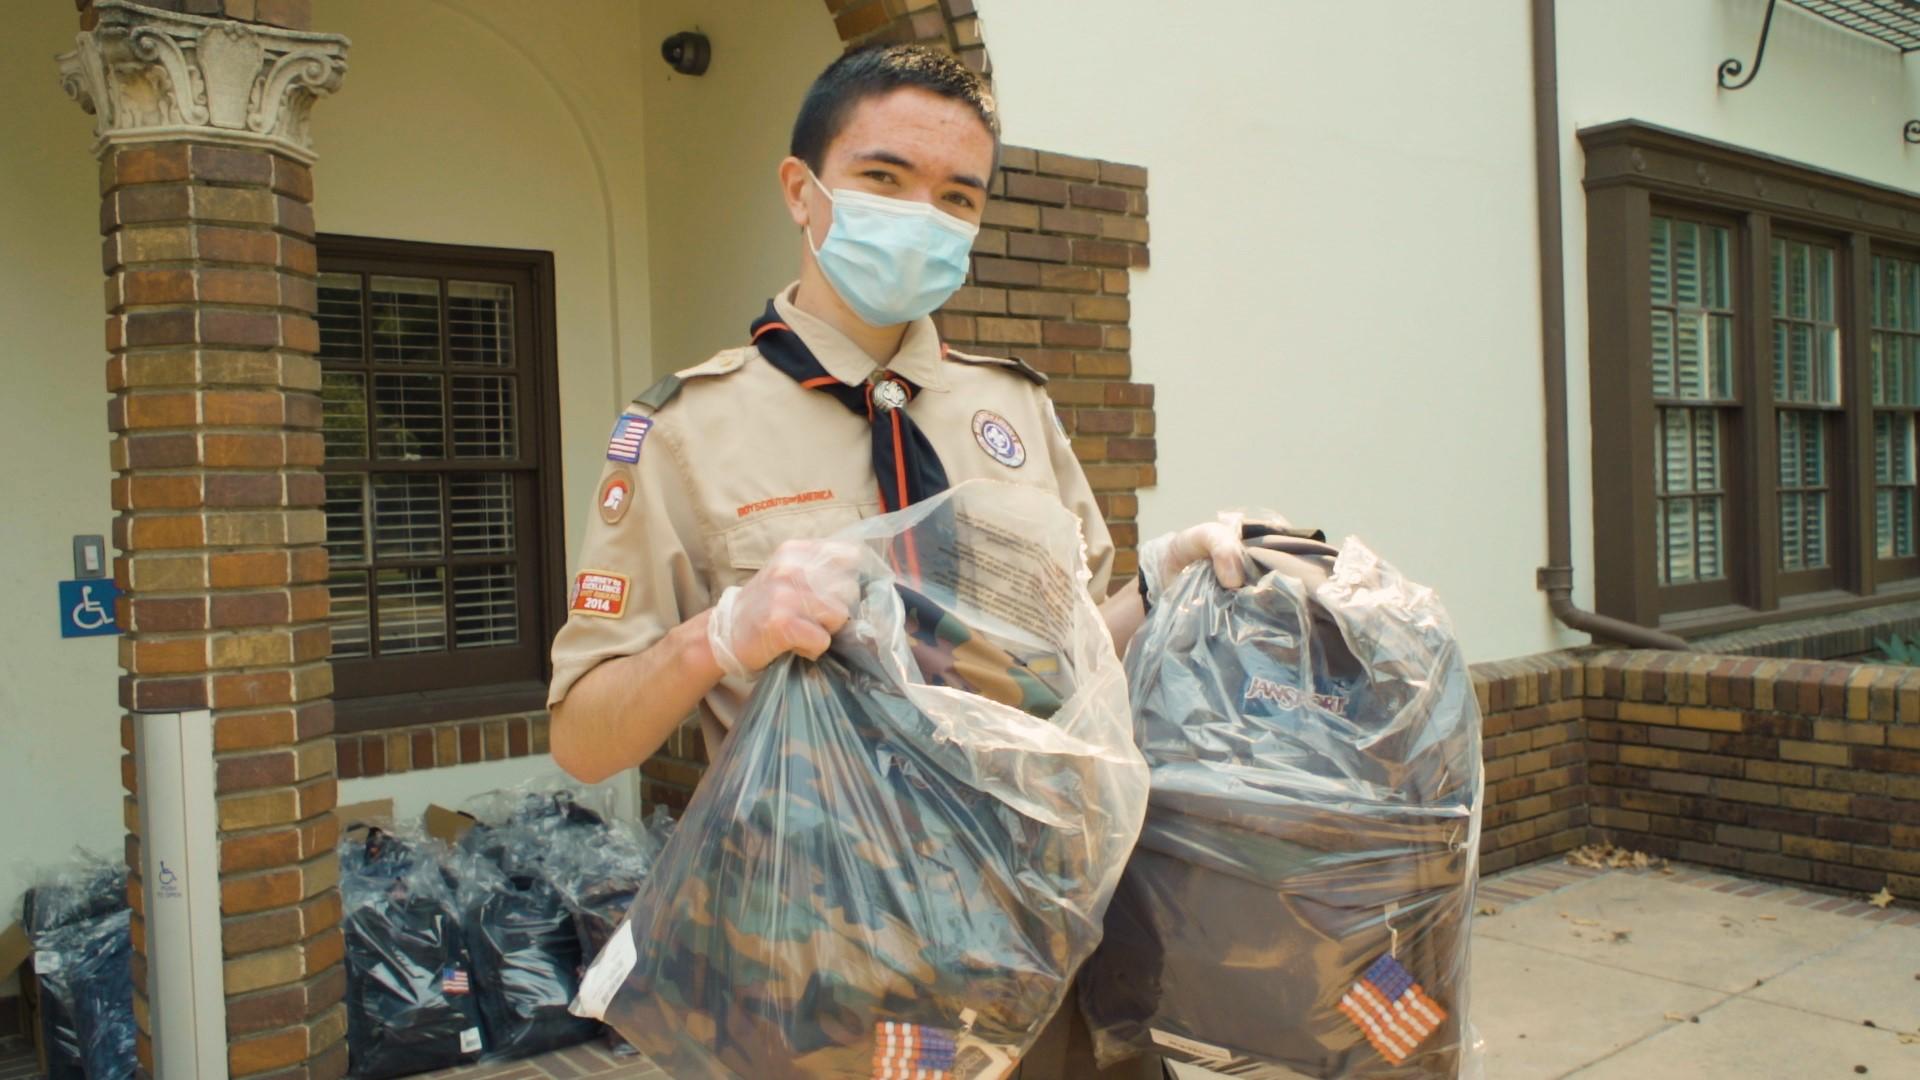 Roseville Boy Fills Backpacks For A Good Cause Everyday Heroes Kare11 Com